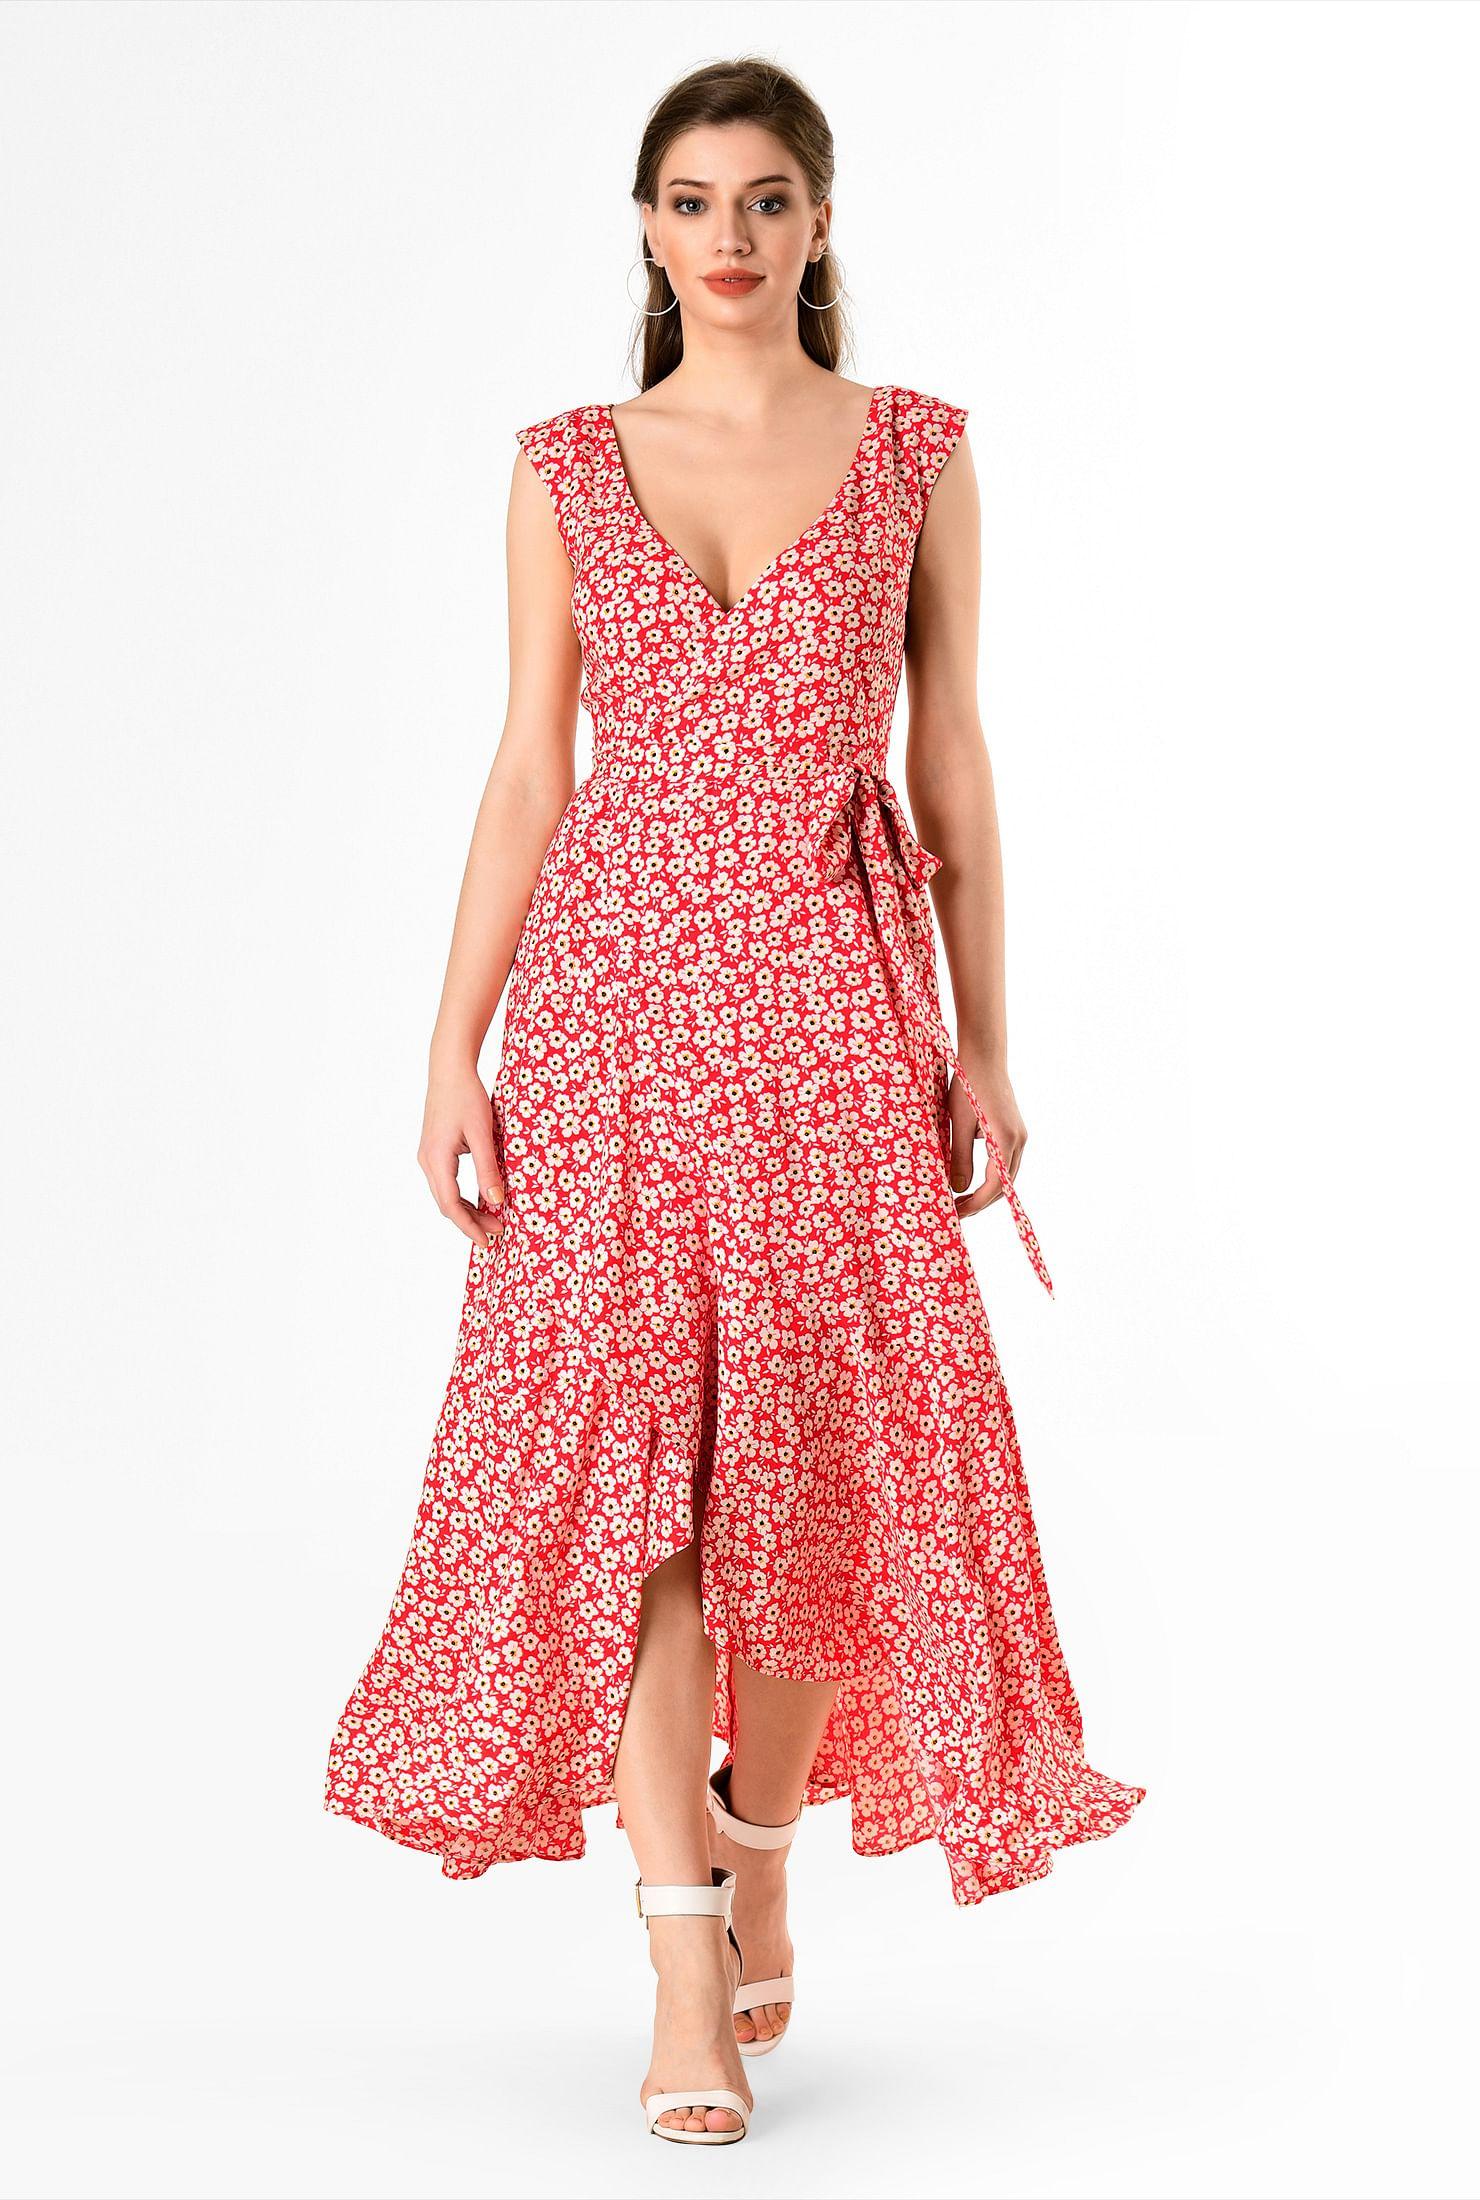 d44aa7e4b9 Women's Fashion Clothing 0-36W and Custom